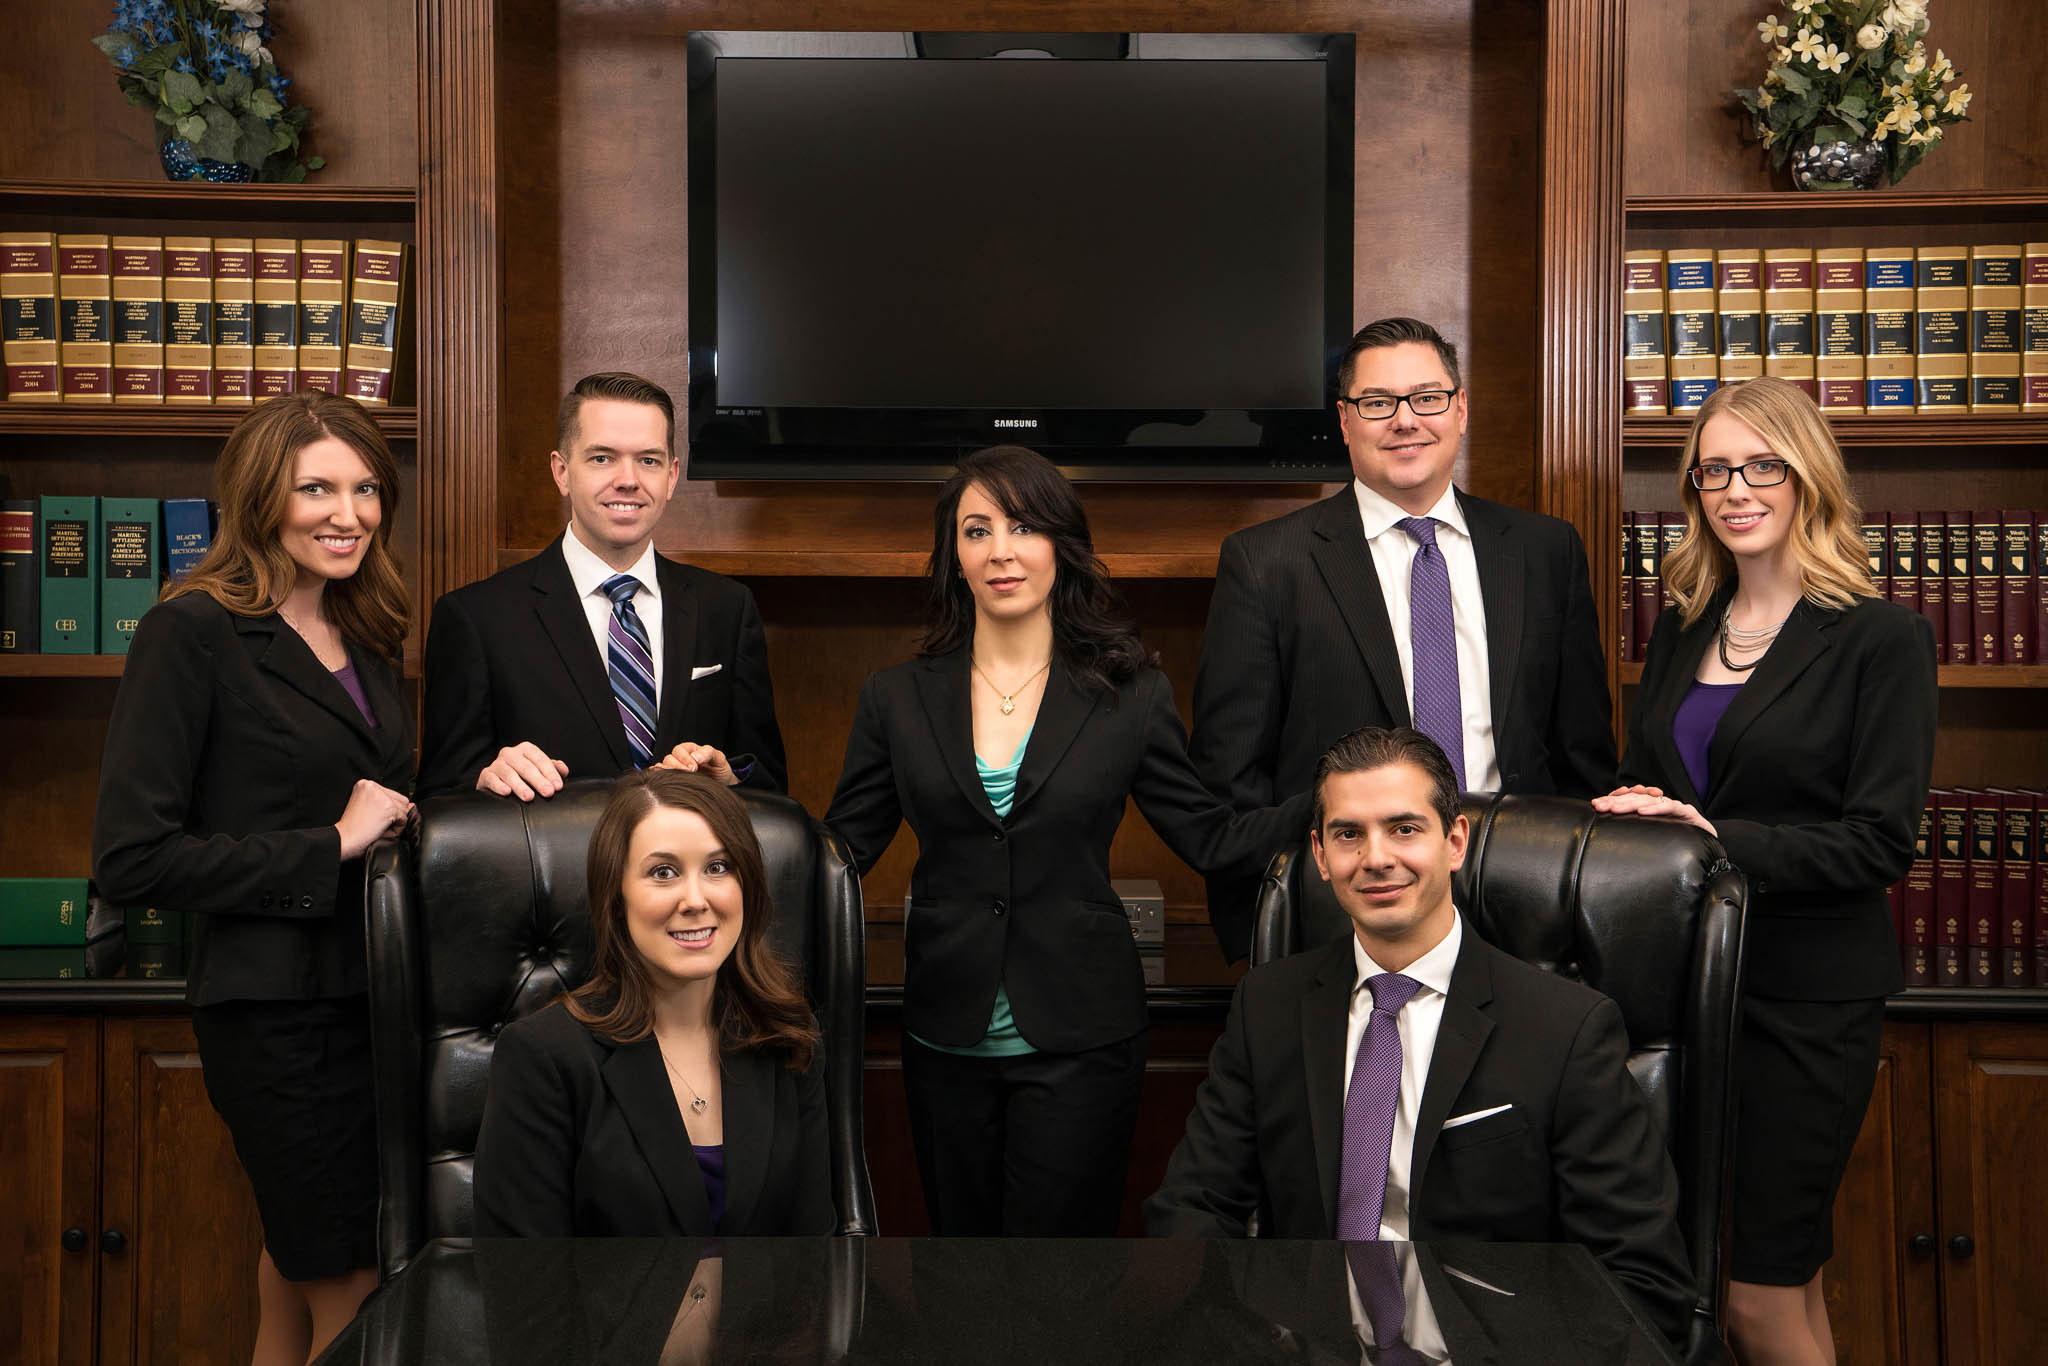 THE ABRAMS LAW FIRM LLC